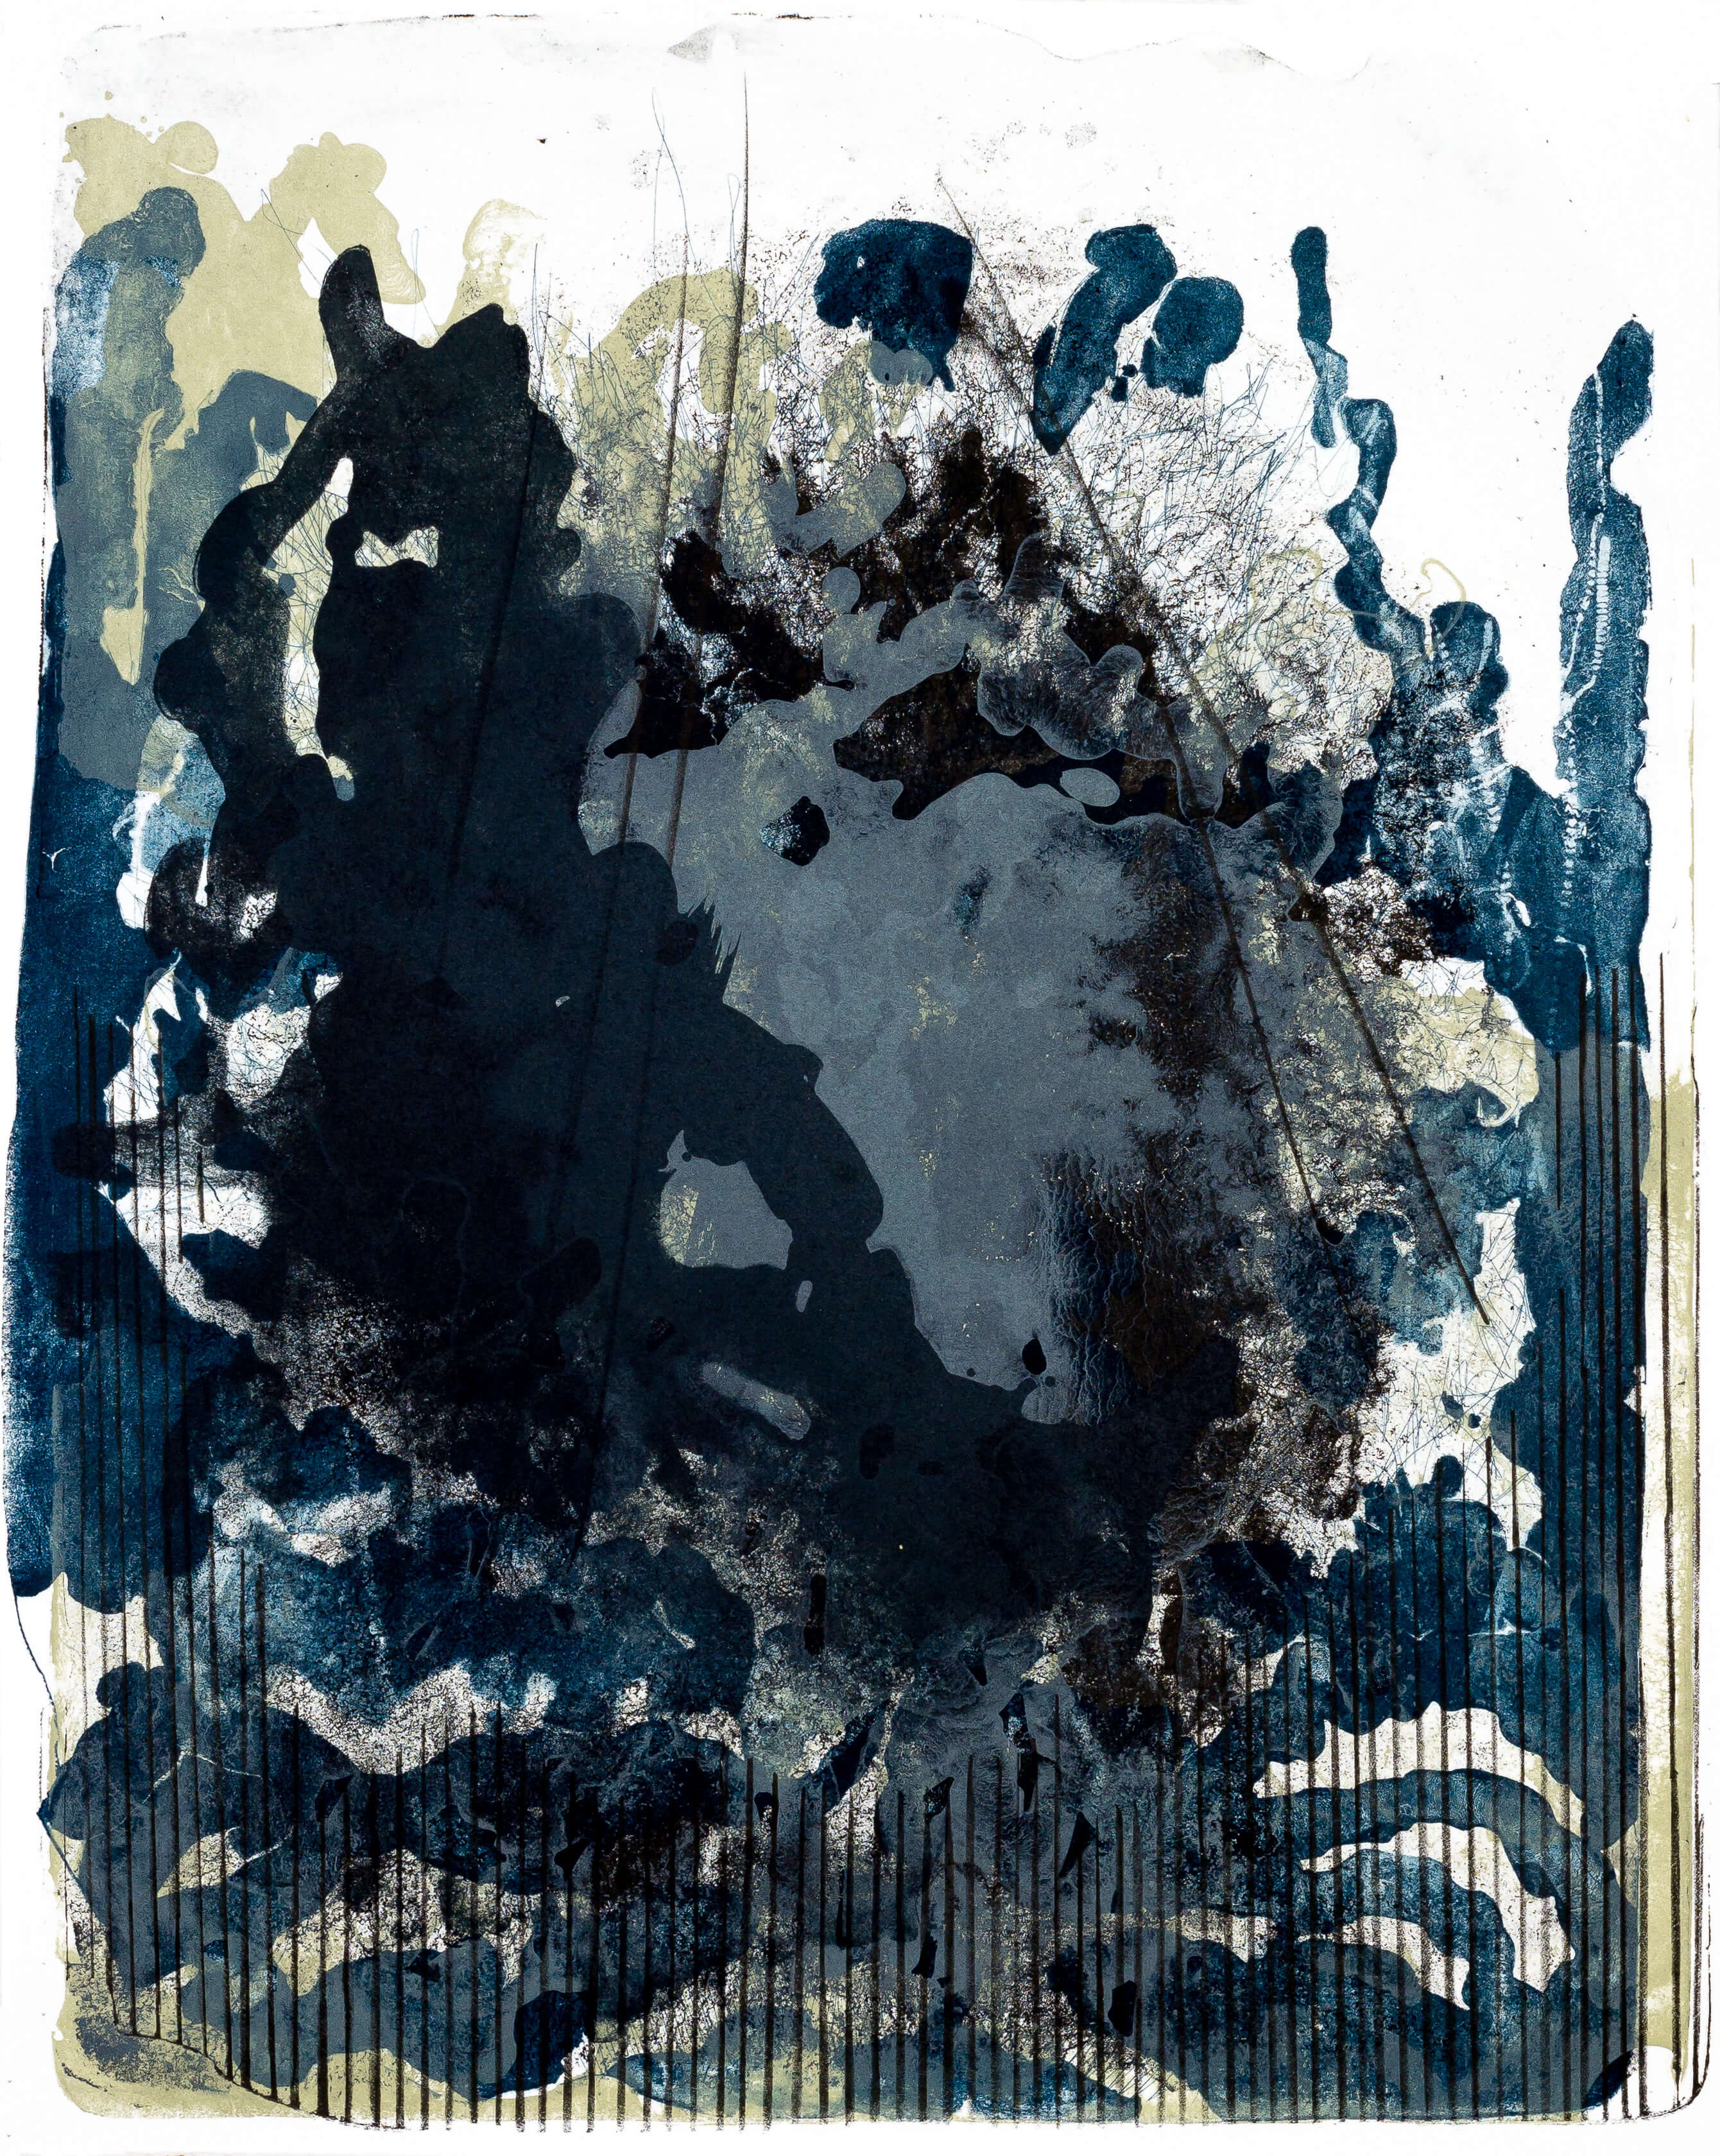 Katharina Albers, organism (Wald) IV, 2016, Farblithographie, Unikat, 50x40 cm